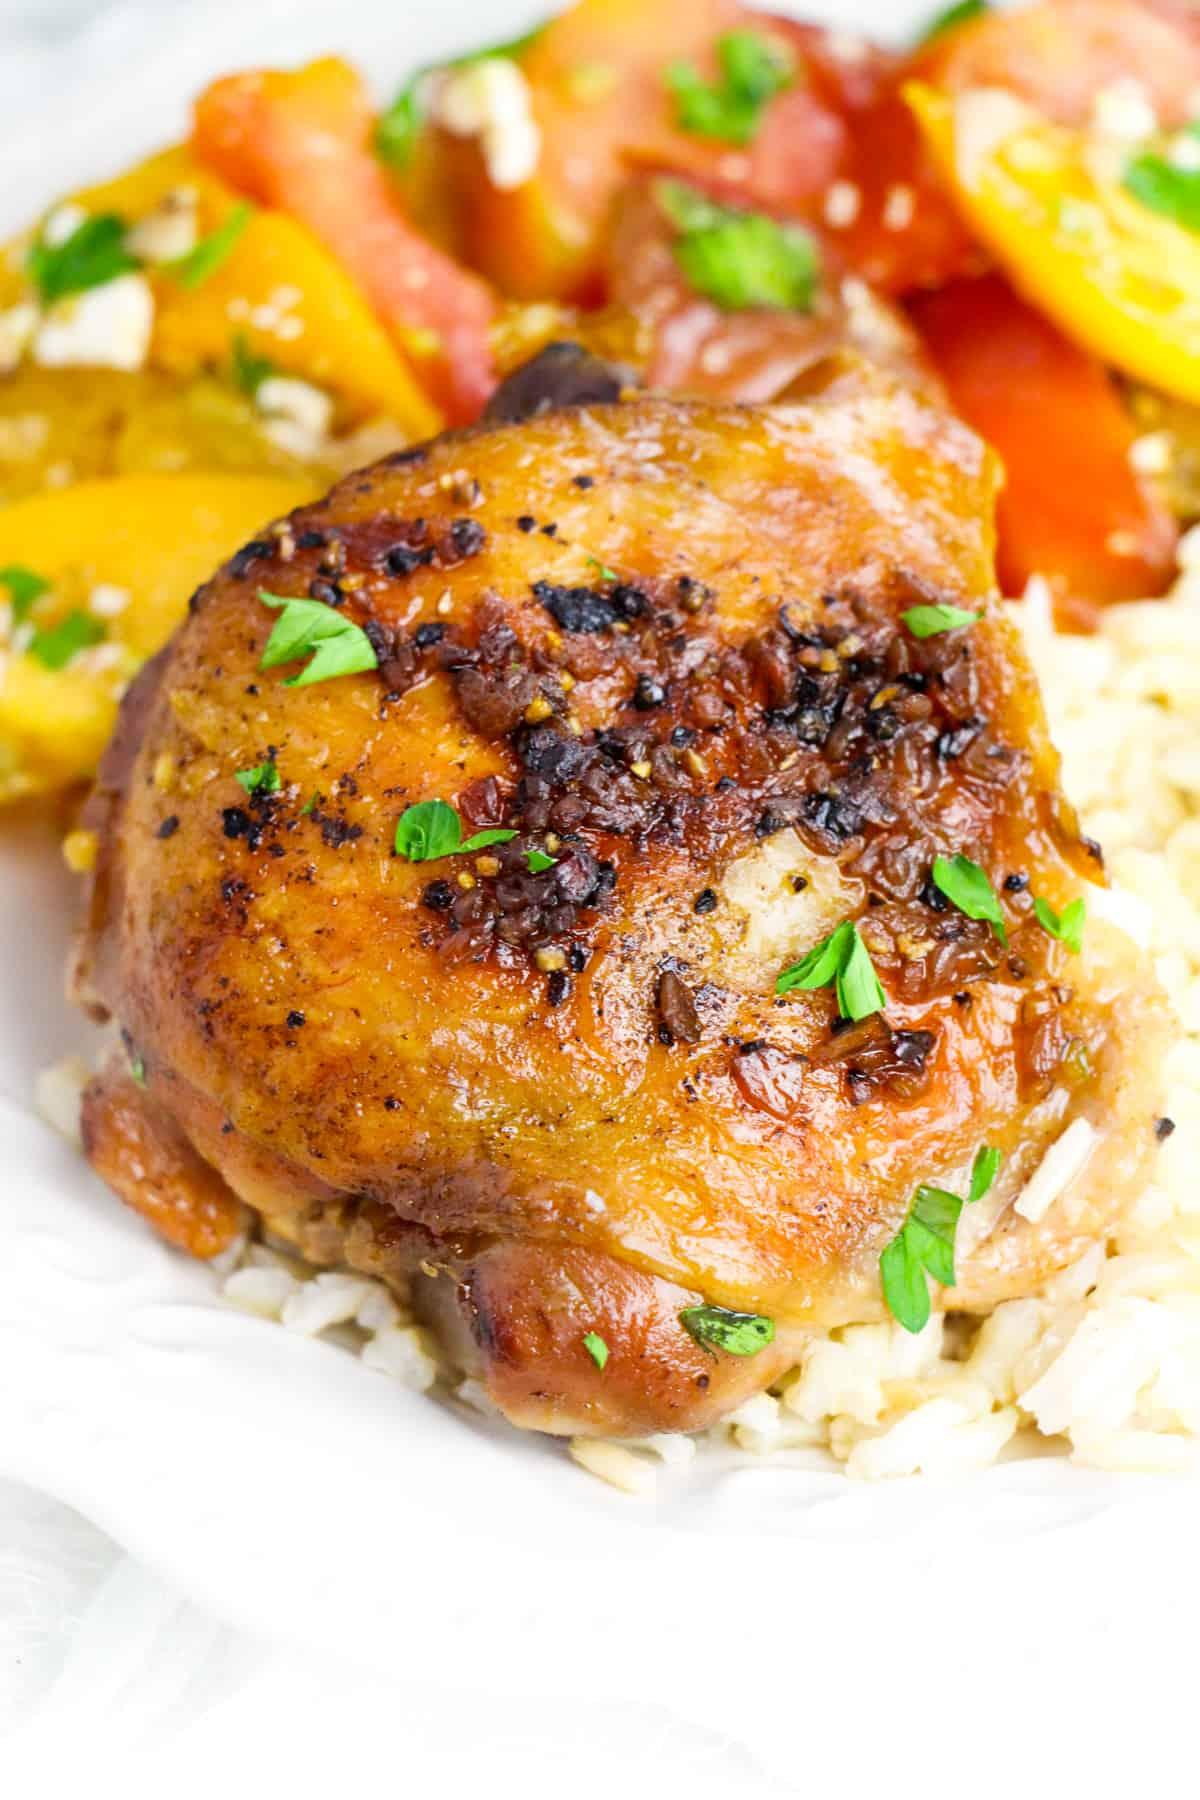 Crockpot brown sugar garlic chicken thigh served over rice with tomato salad